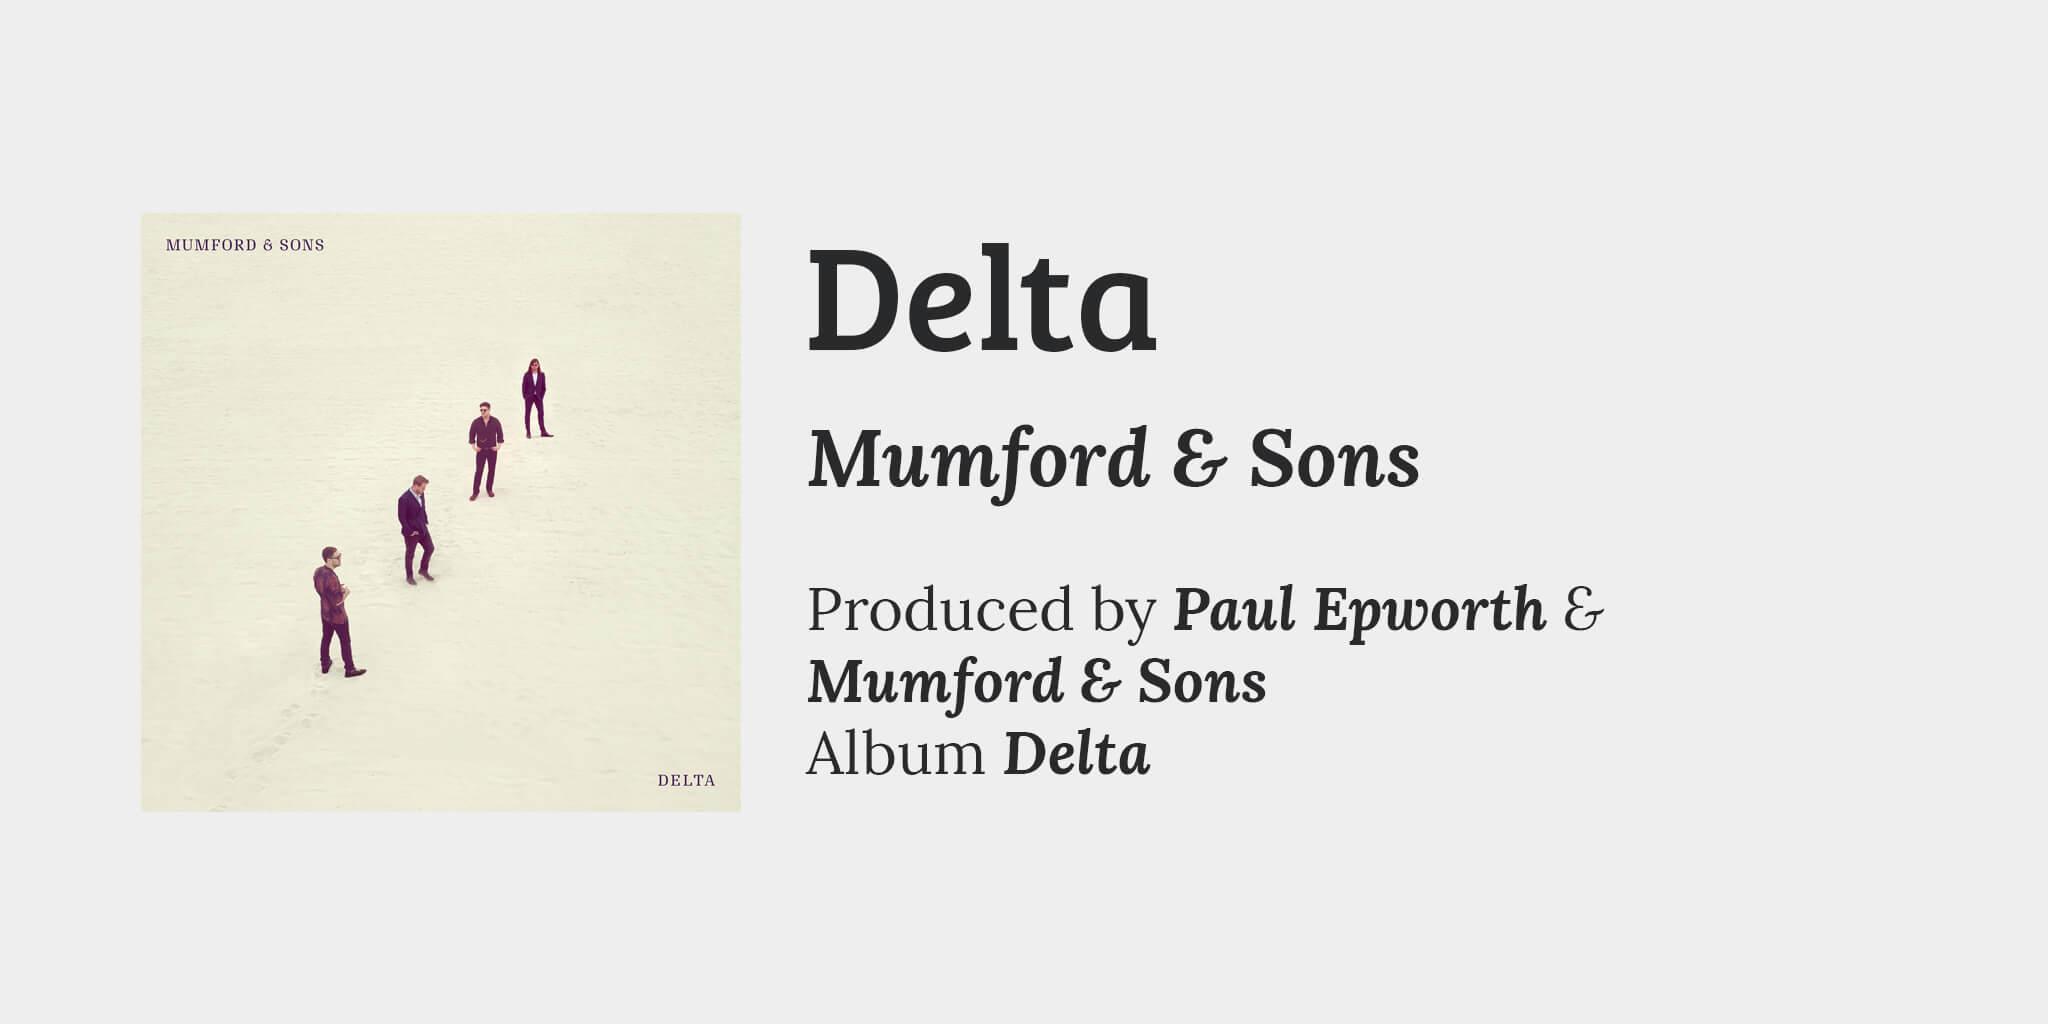 Delta song info